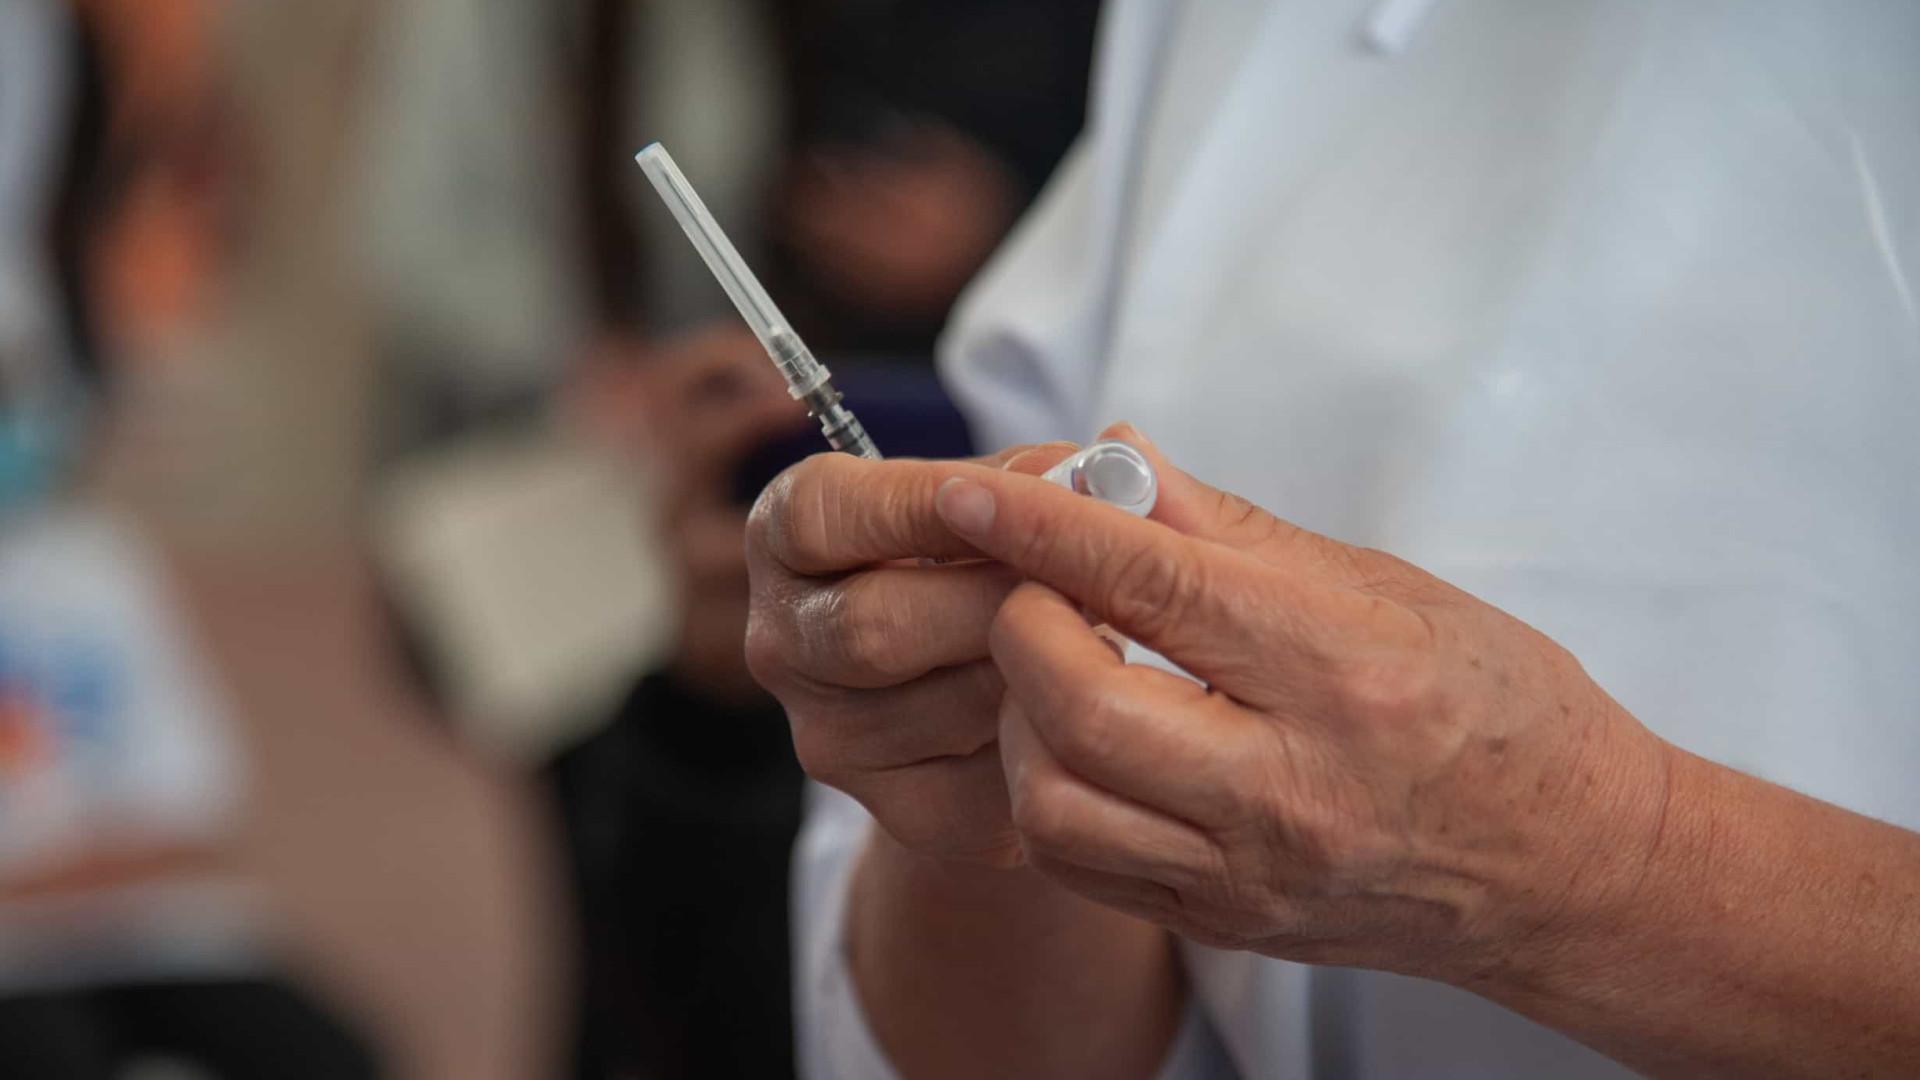 Dose de vacina Pfizer após duas Coronavac aumenta 20 vezes anticorpos